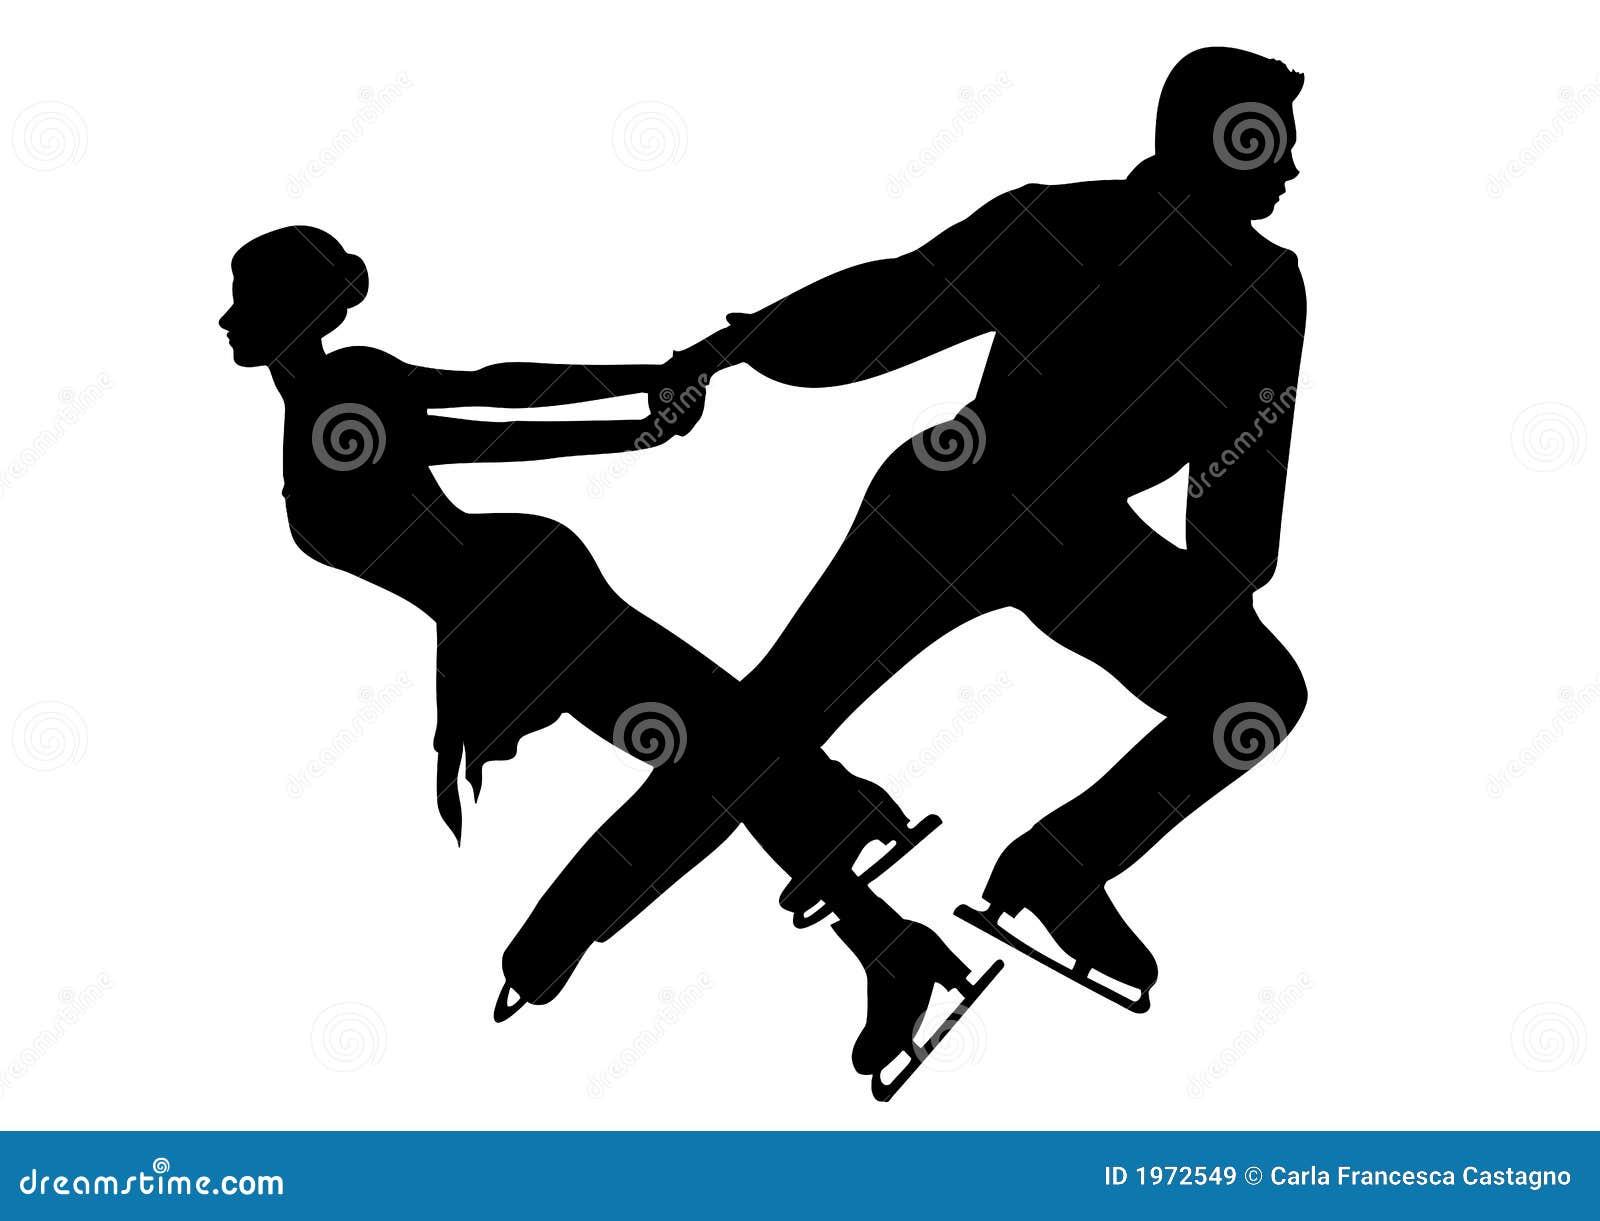 Couple Skate - Ice Skate Lobotomy